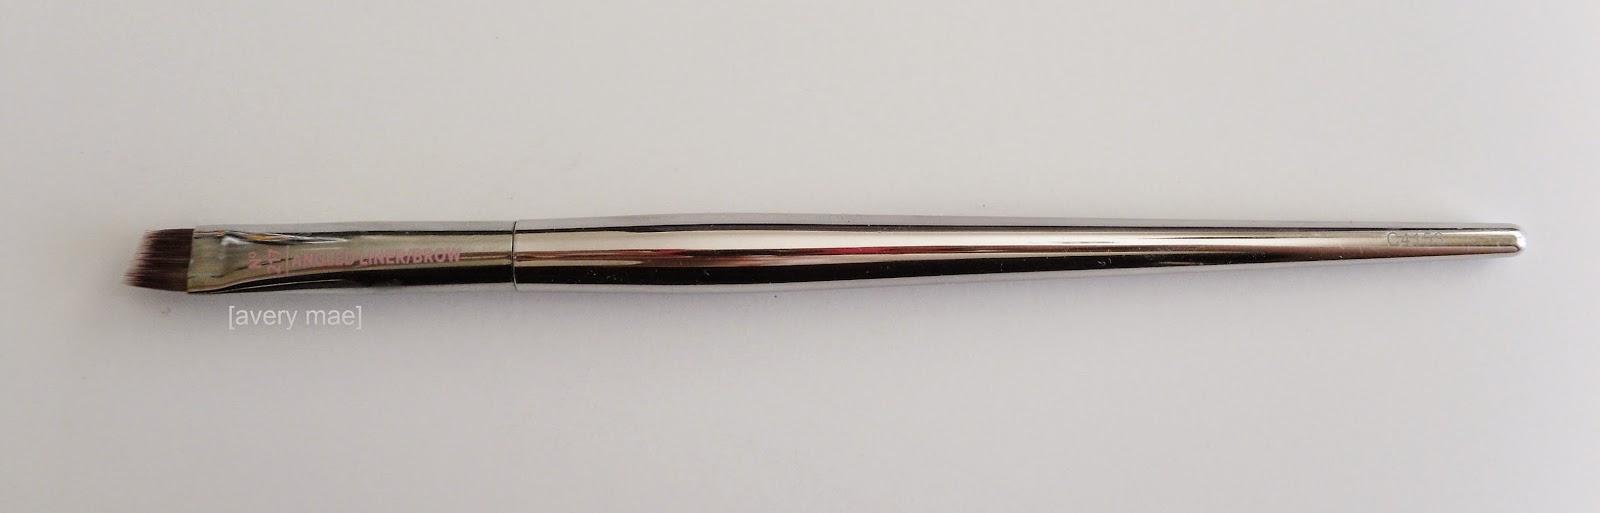 It Cosmetics x ULTA Love Beauty Fully Angled Liner/Brow Brush #217 by IT Cosmetics #20